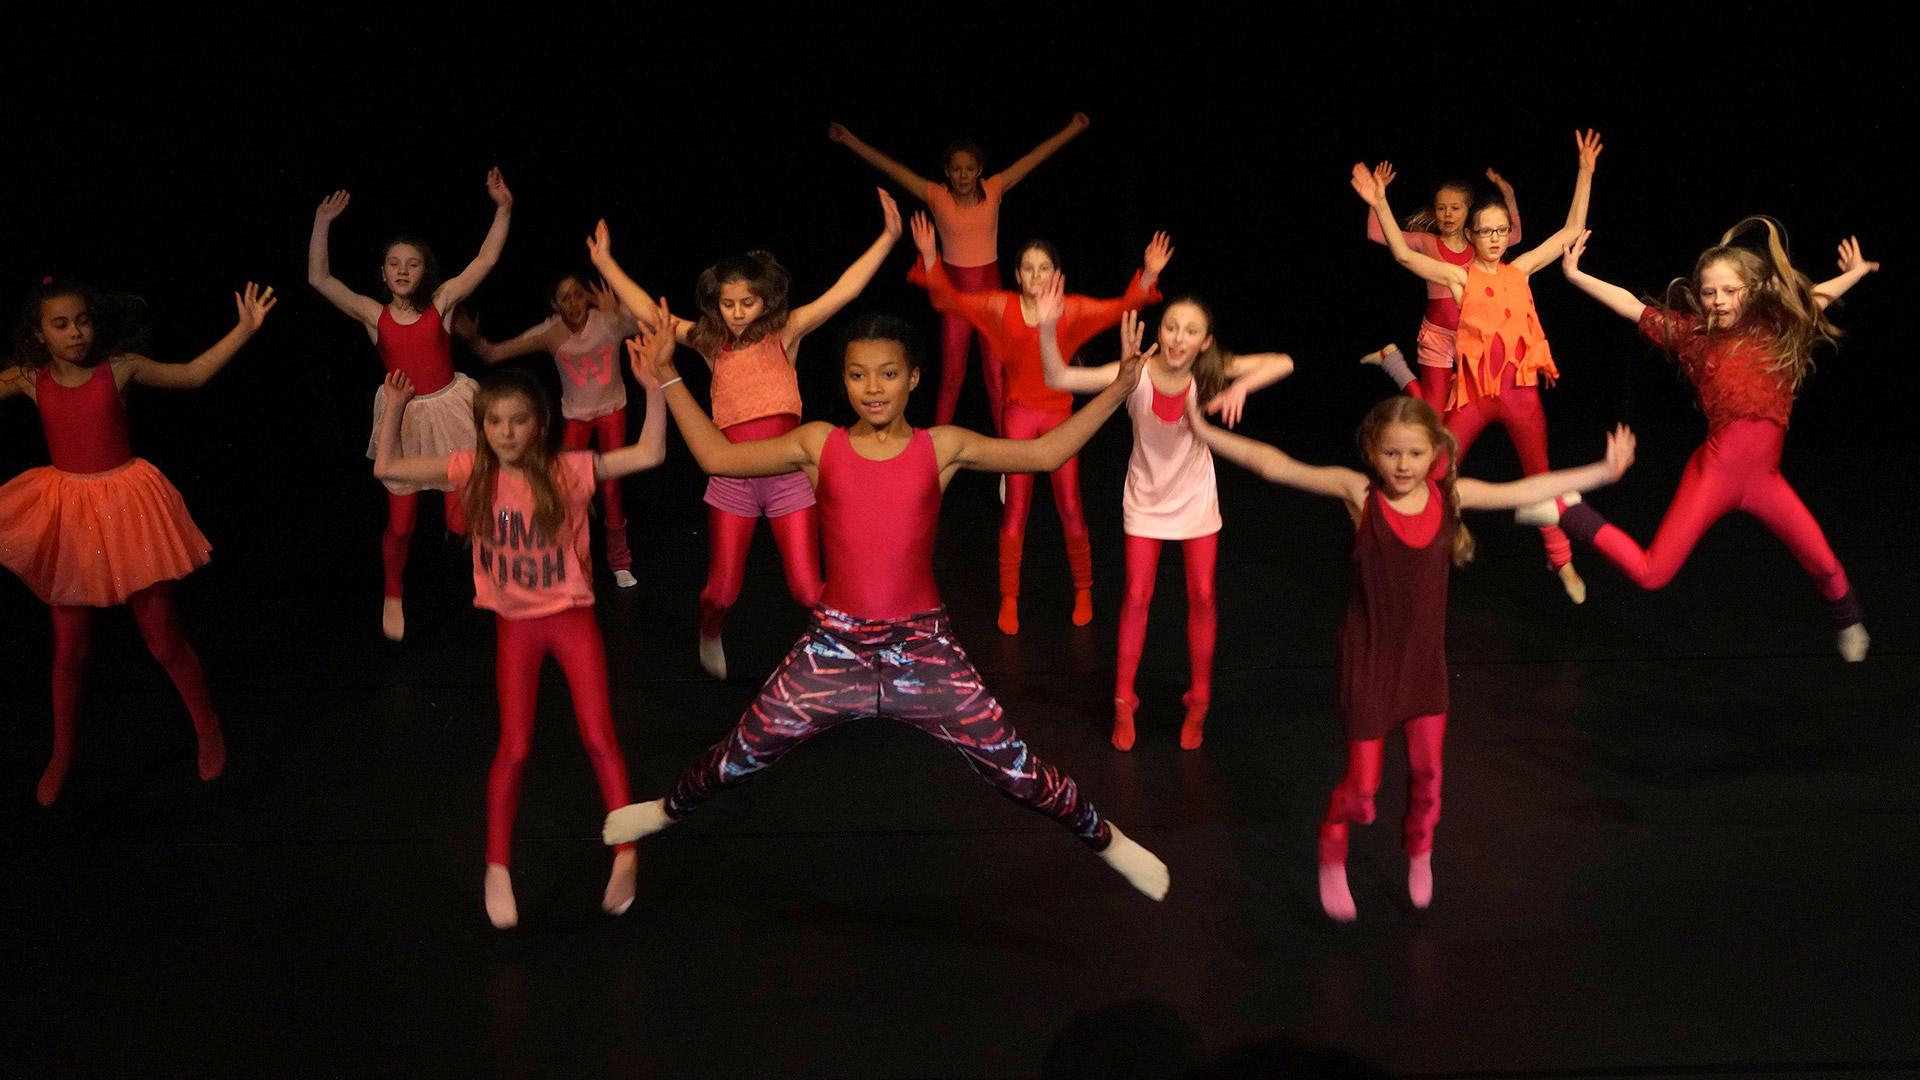 Förderverein Junges Tanztheater Heidelberg